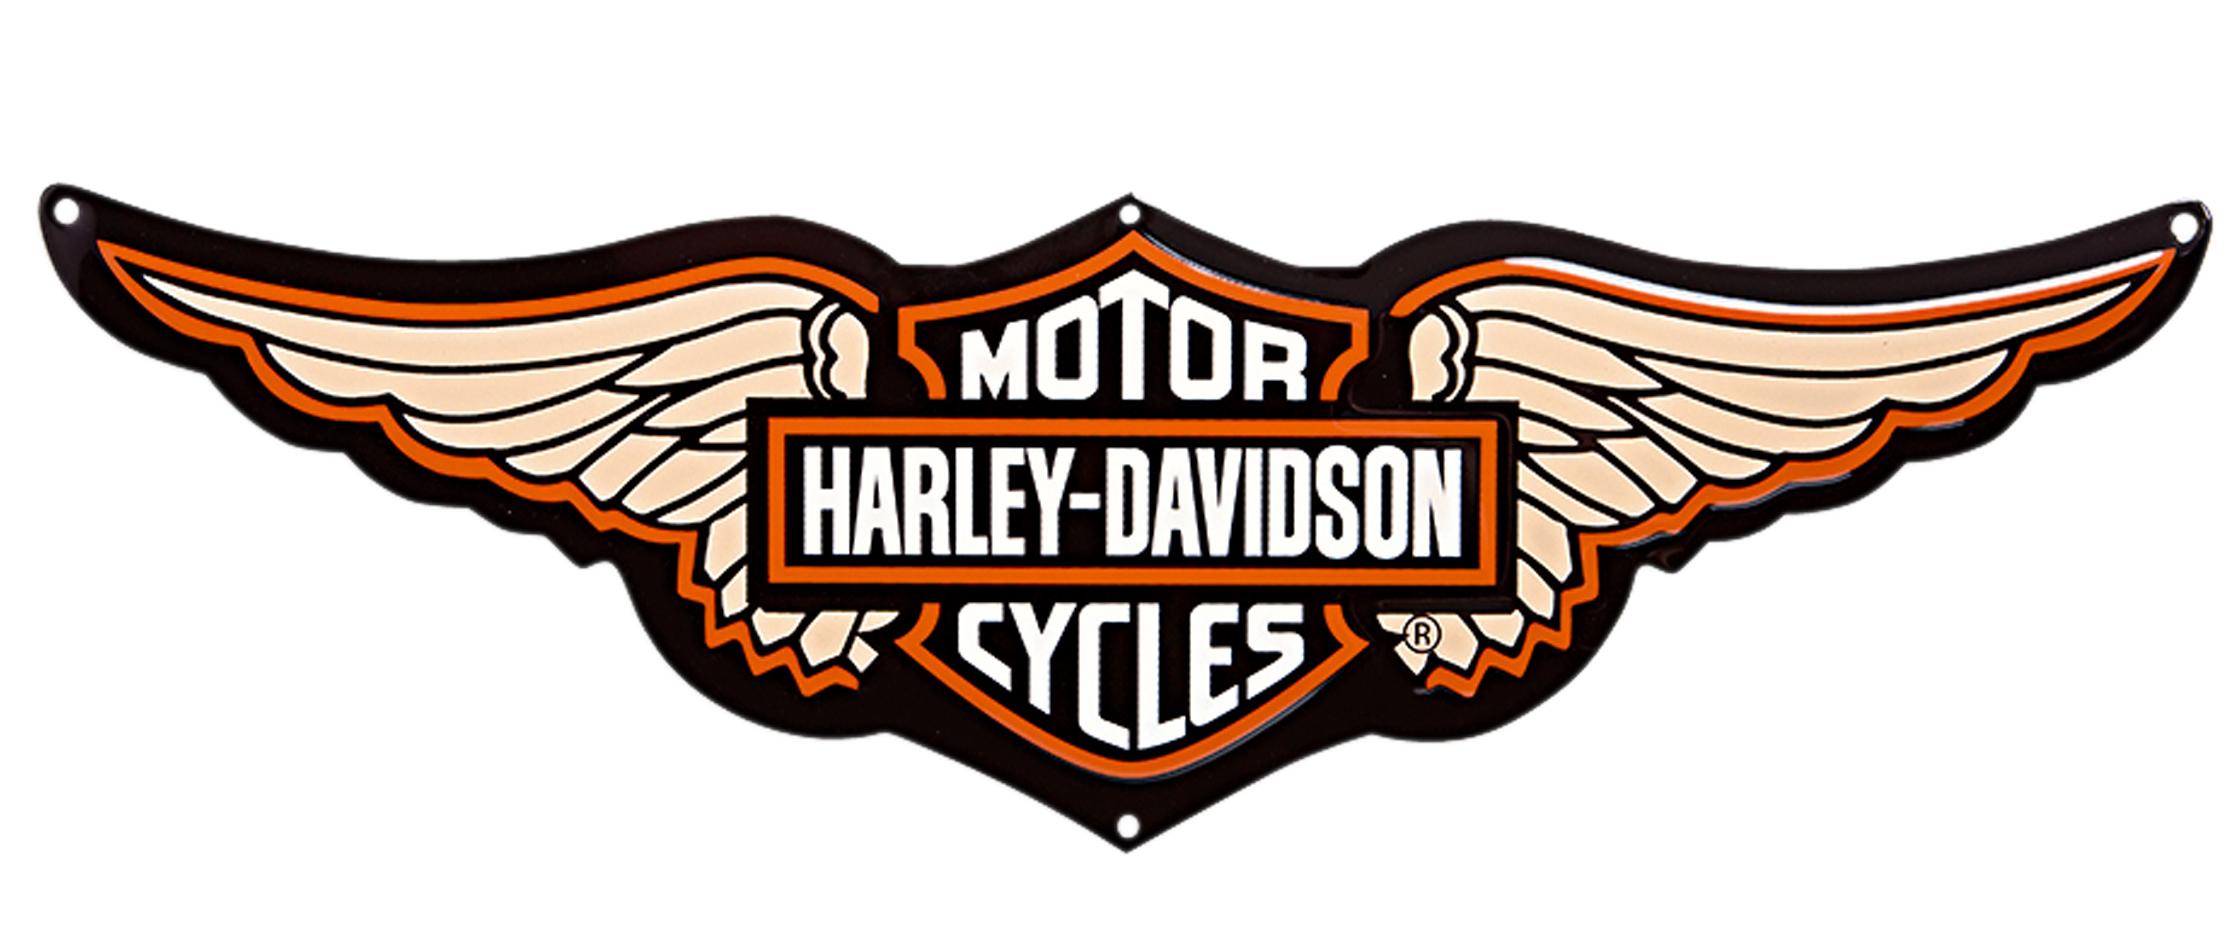 2240x952 Harley Davidson Logo Vector Best Of Best Free Excellent Harley